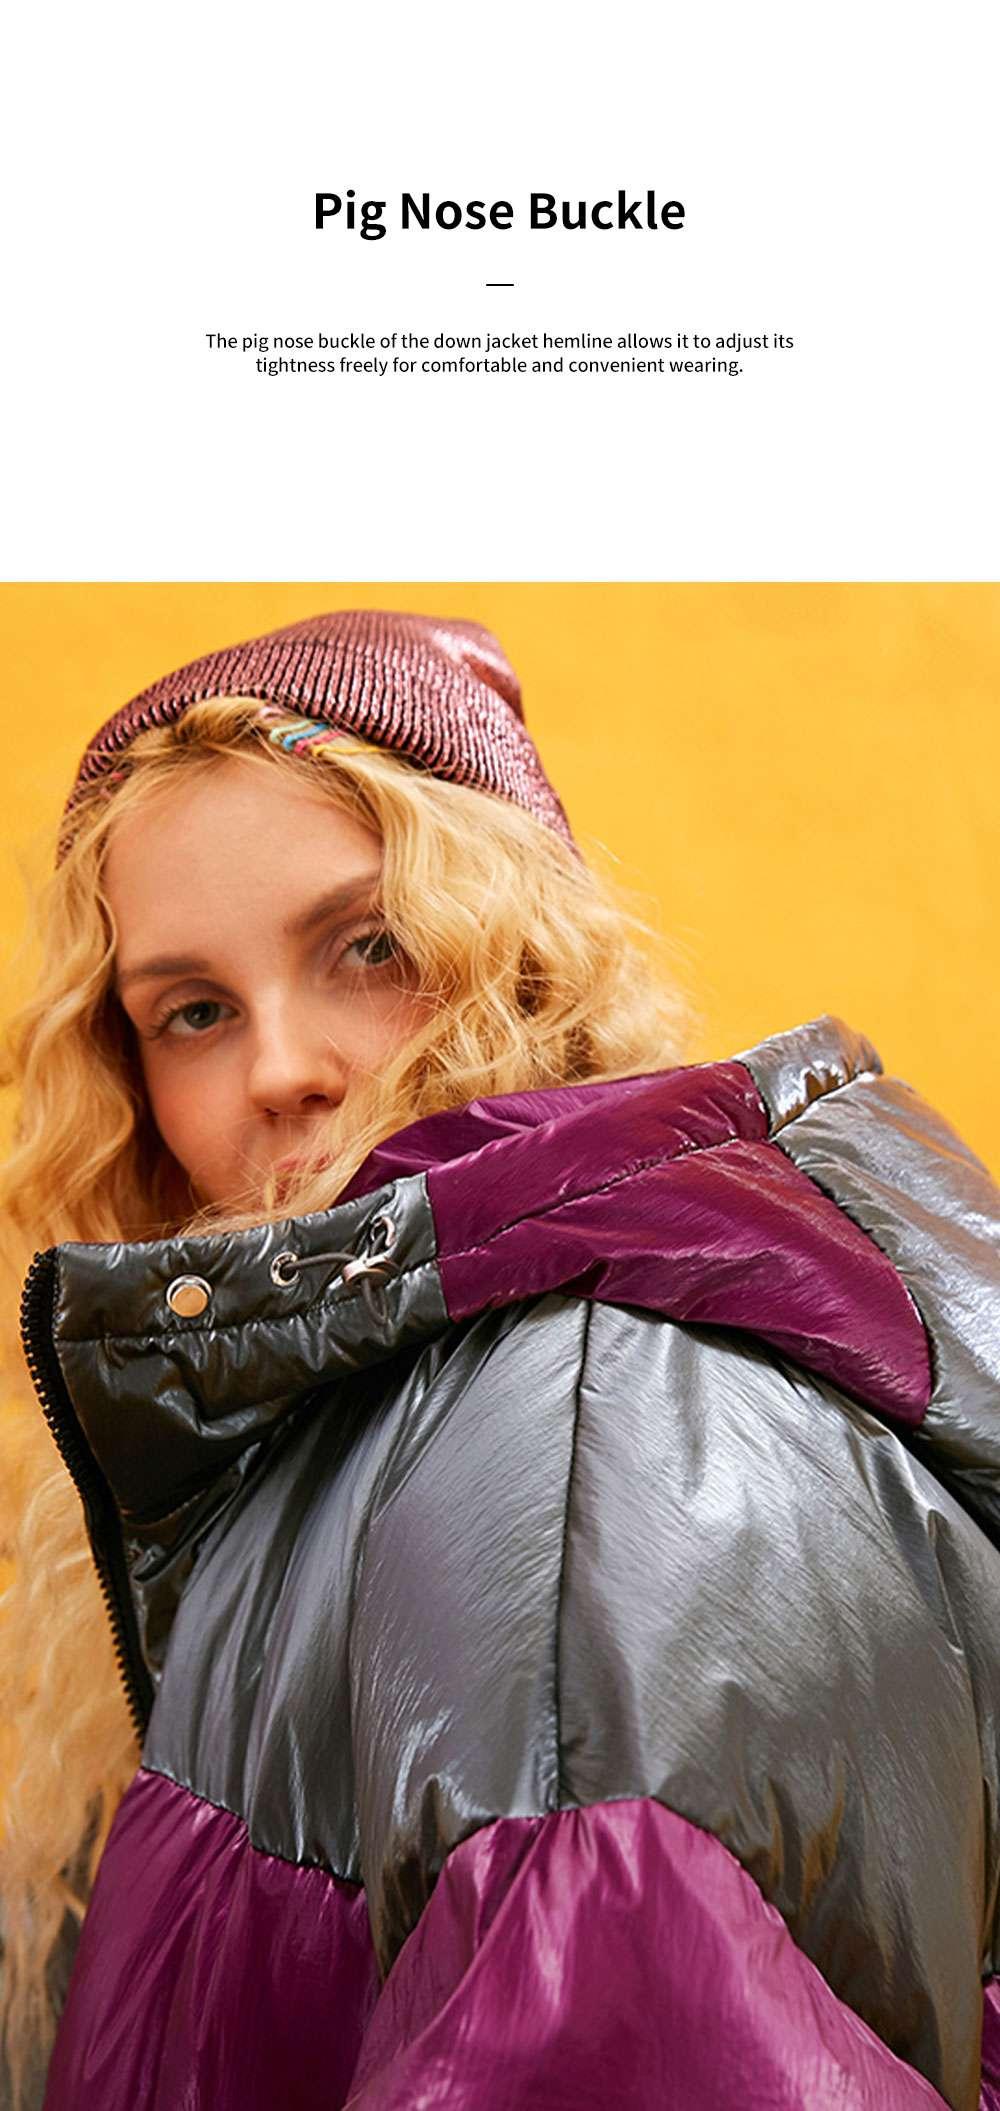 ELFSACK 2019 NEW Splicing Glossy Down Jacket for Women Winter Wear Loose Down Coat Fashion Down Jacket 4